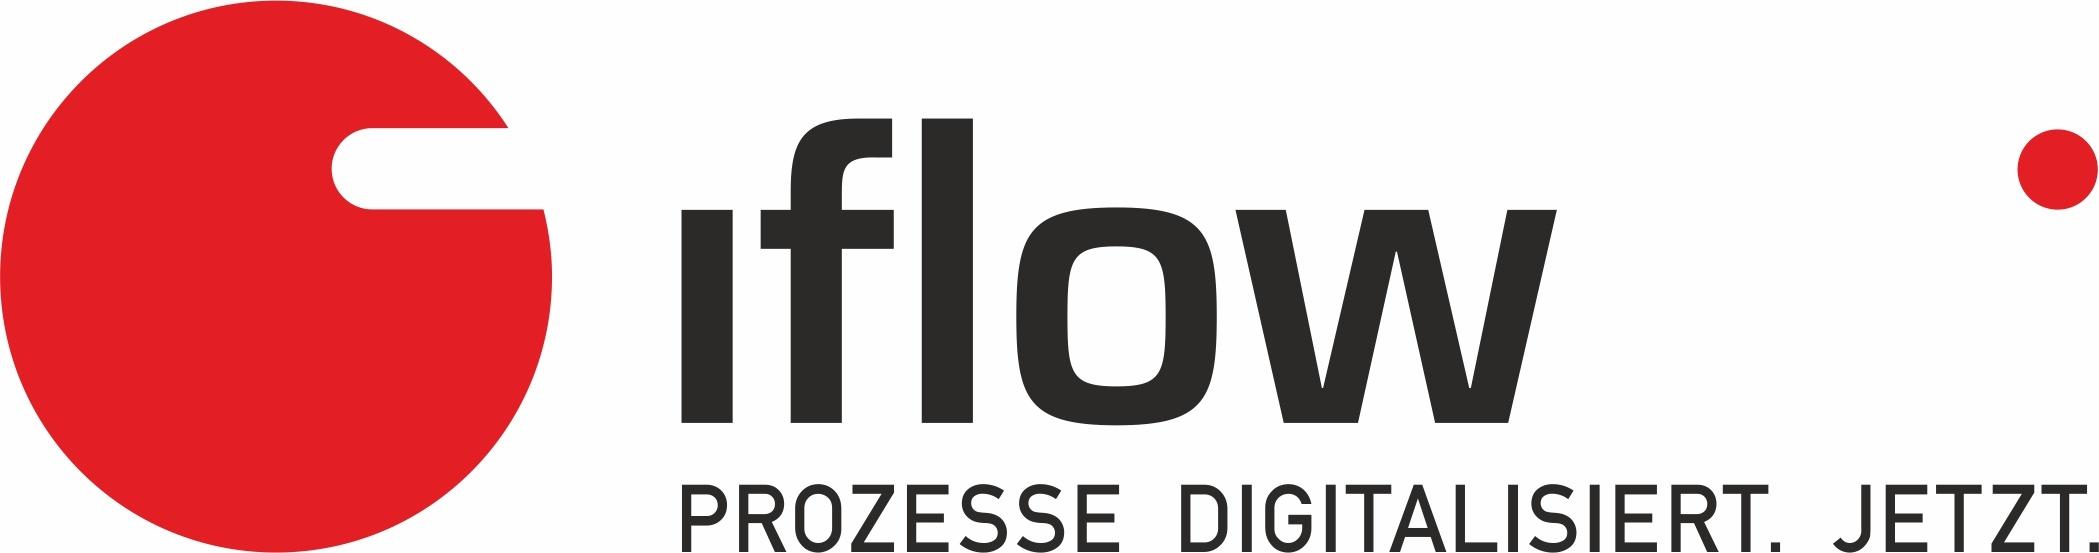 iflow-logo.jpg